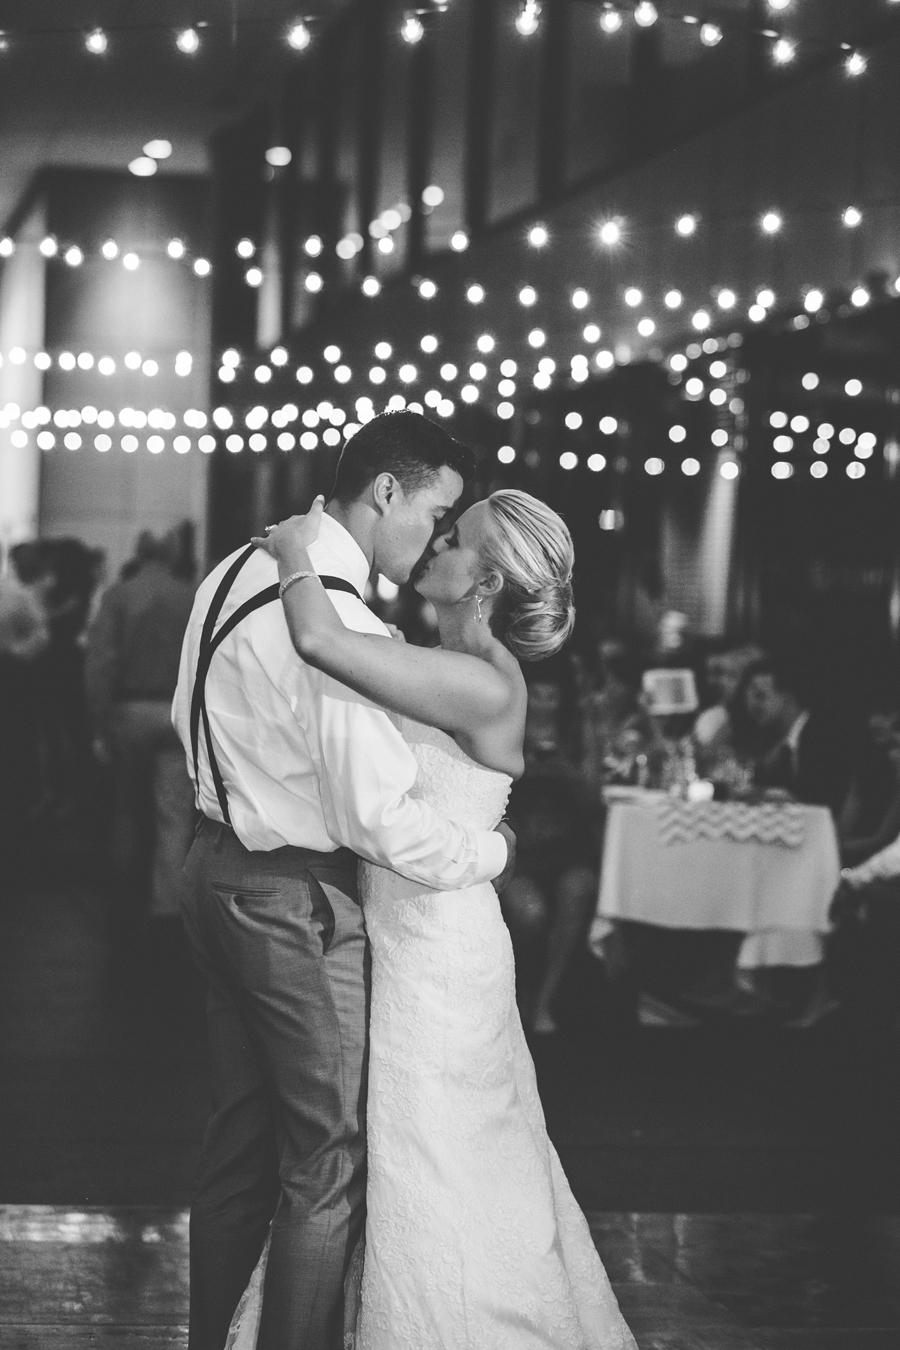 artistrie-co-best-wedding-photos-2015-025